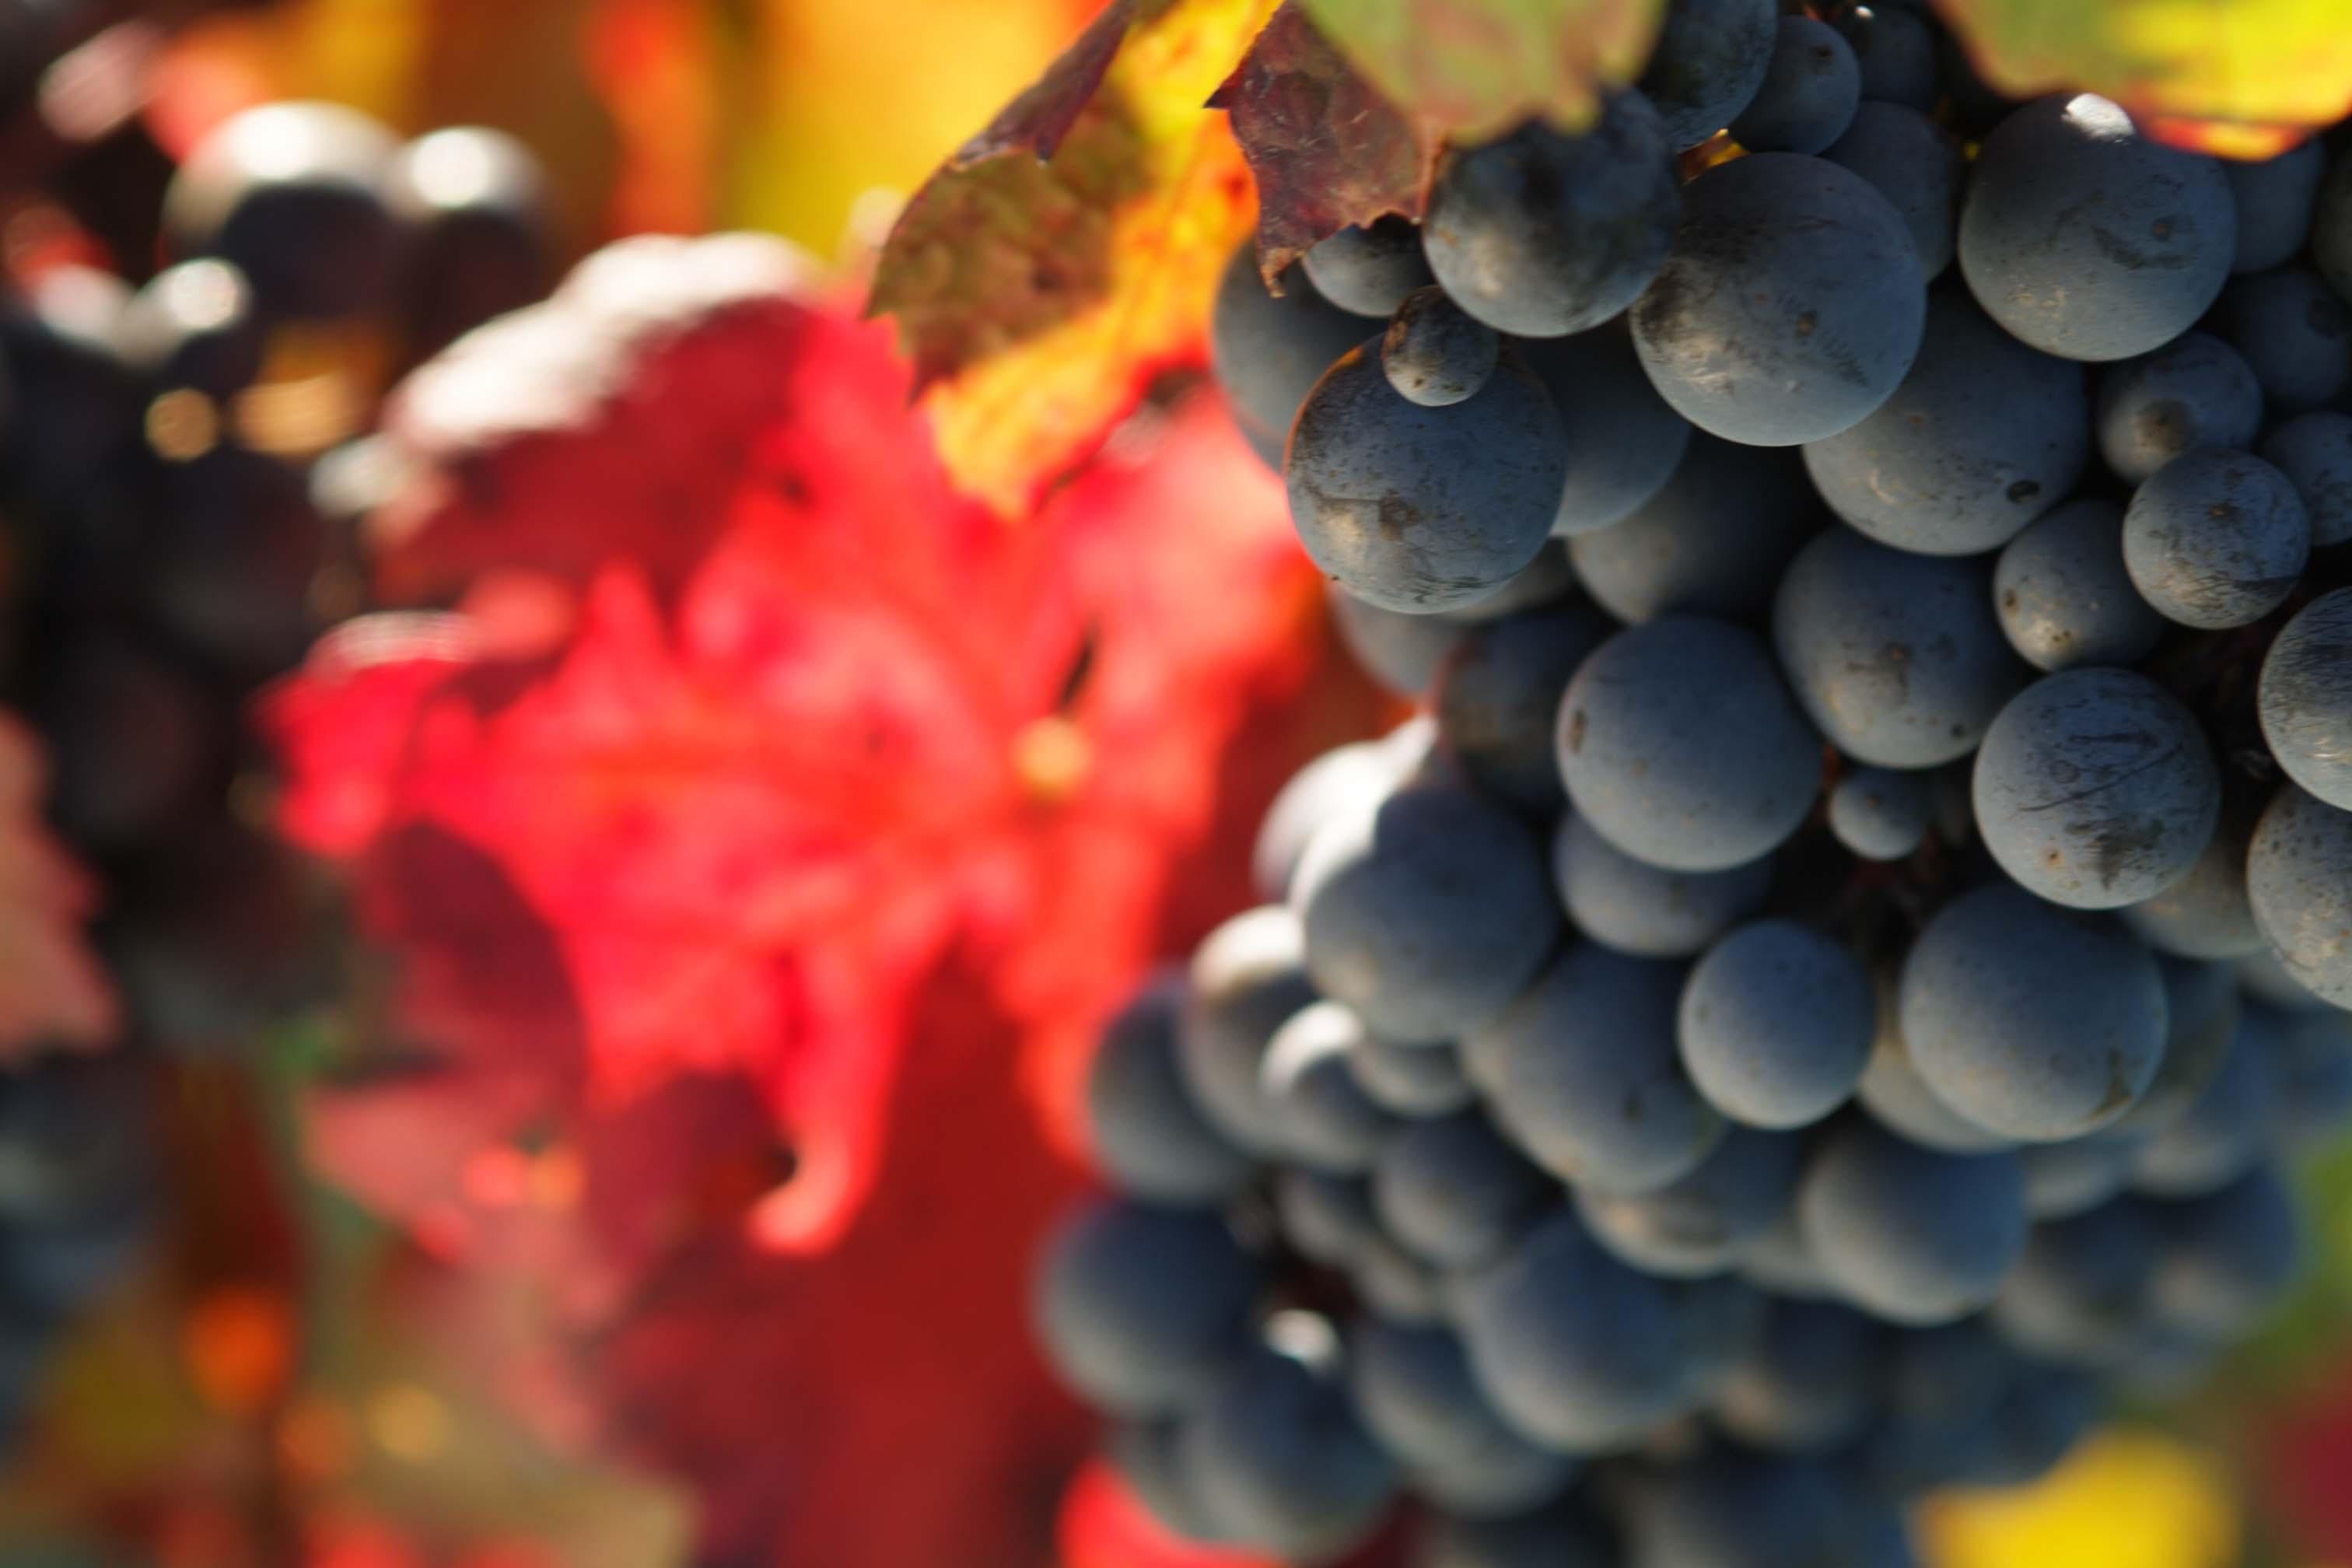 Semplificare l'agricoltura biologica, l'Ue consulta i produttori